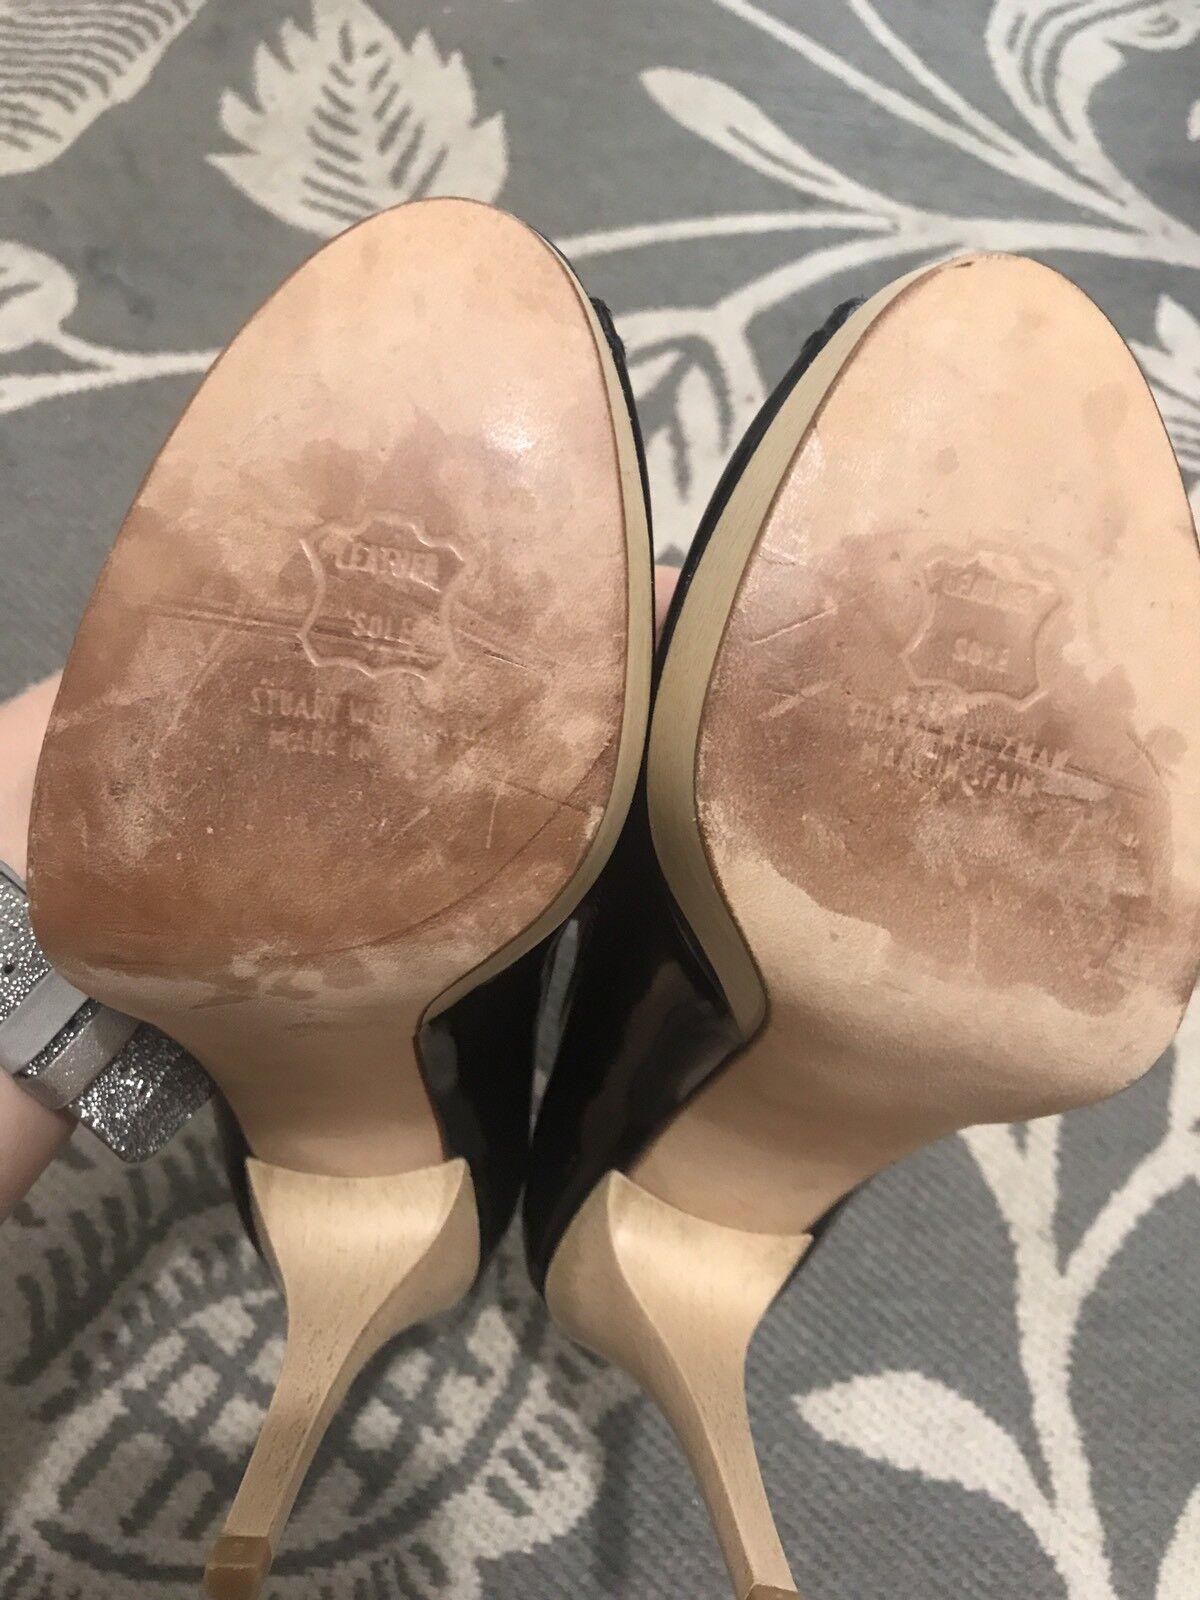 465 465 465 NEW Stuart Weitzman schwarz patent leather wooden platform peep toe pumps 9M a6ebec